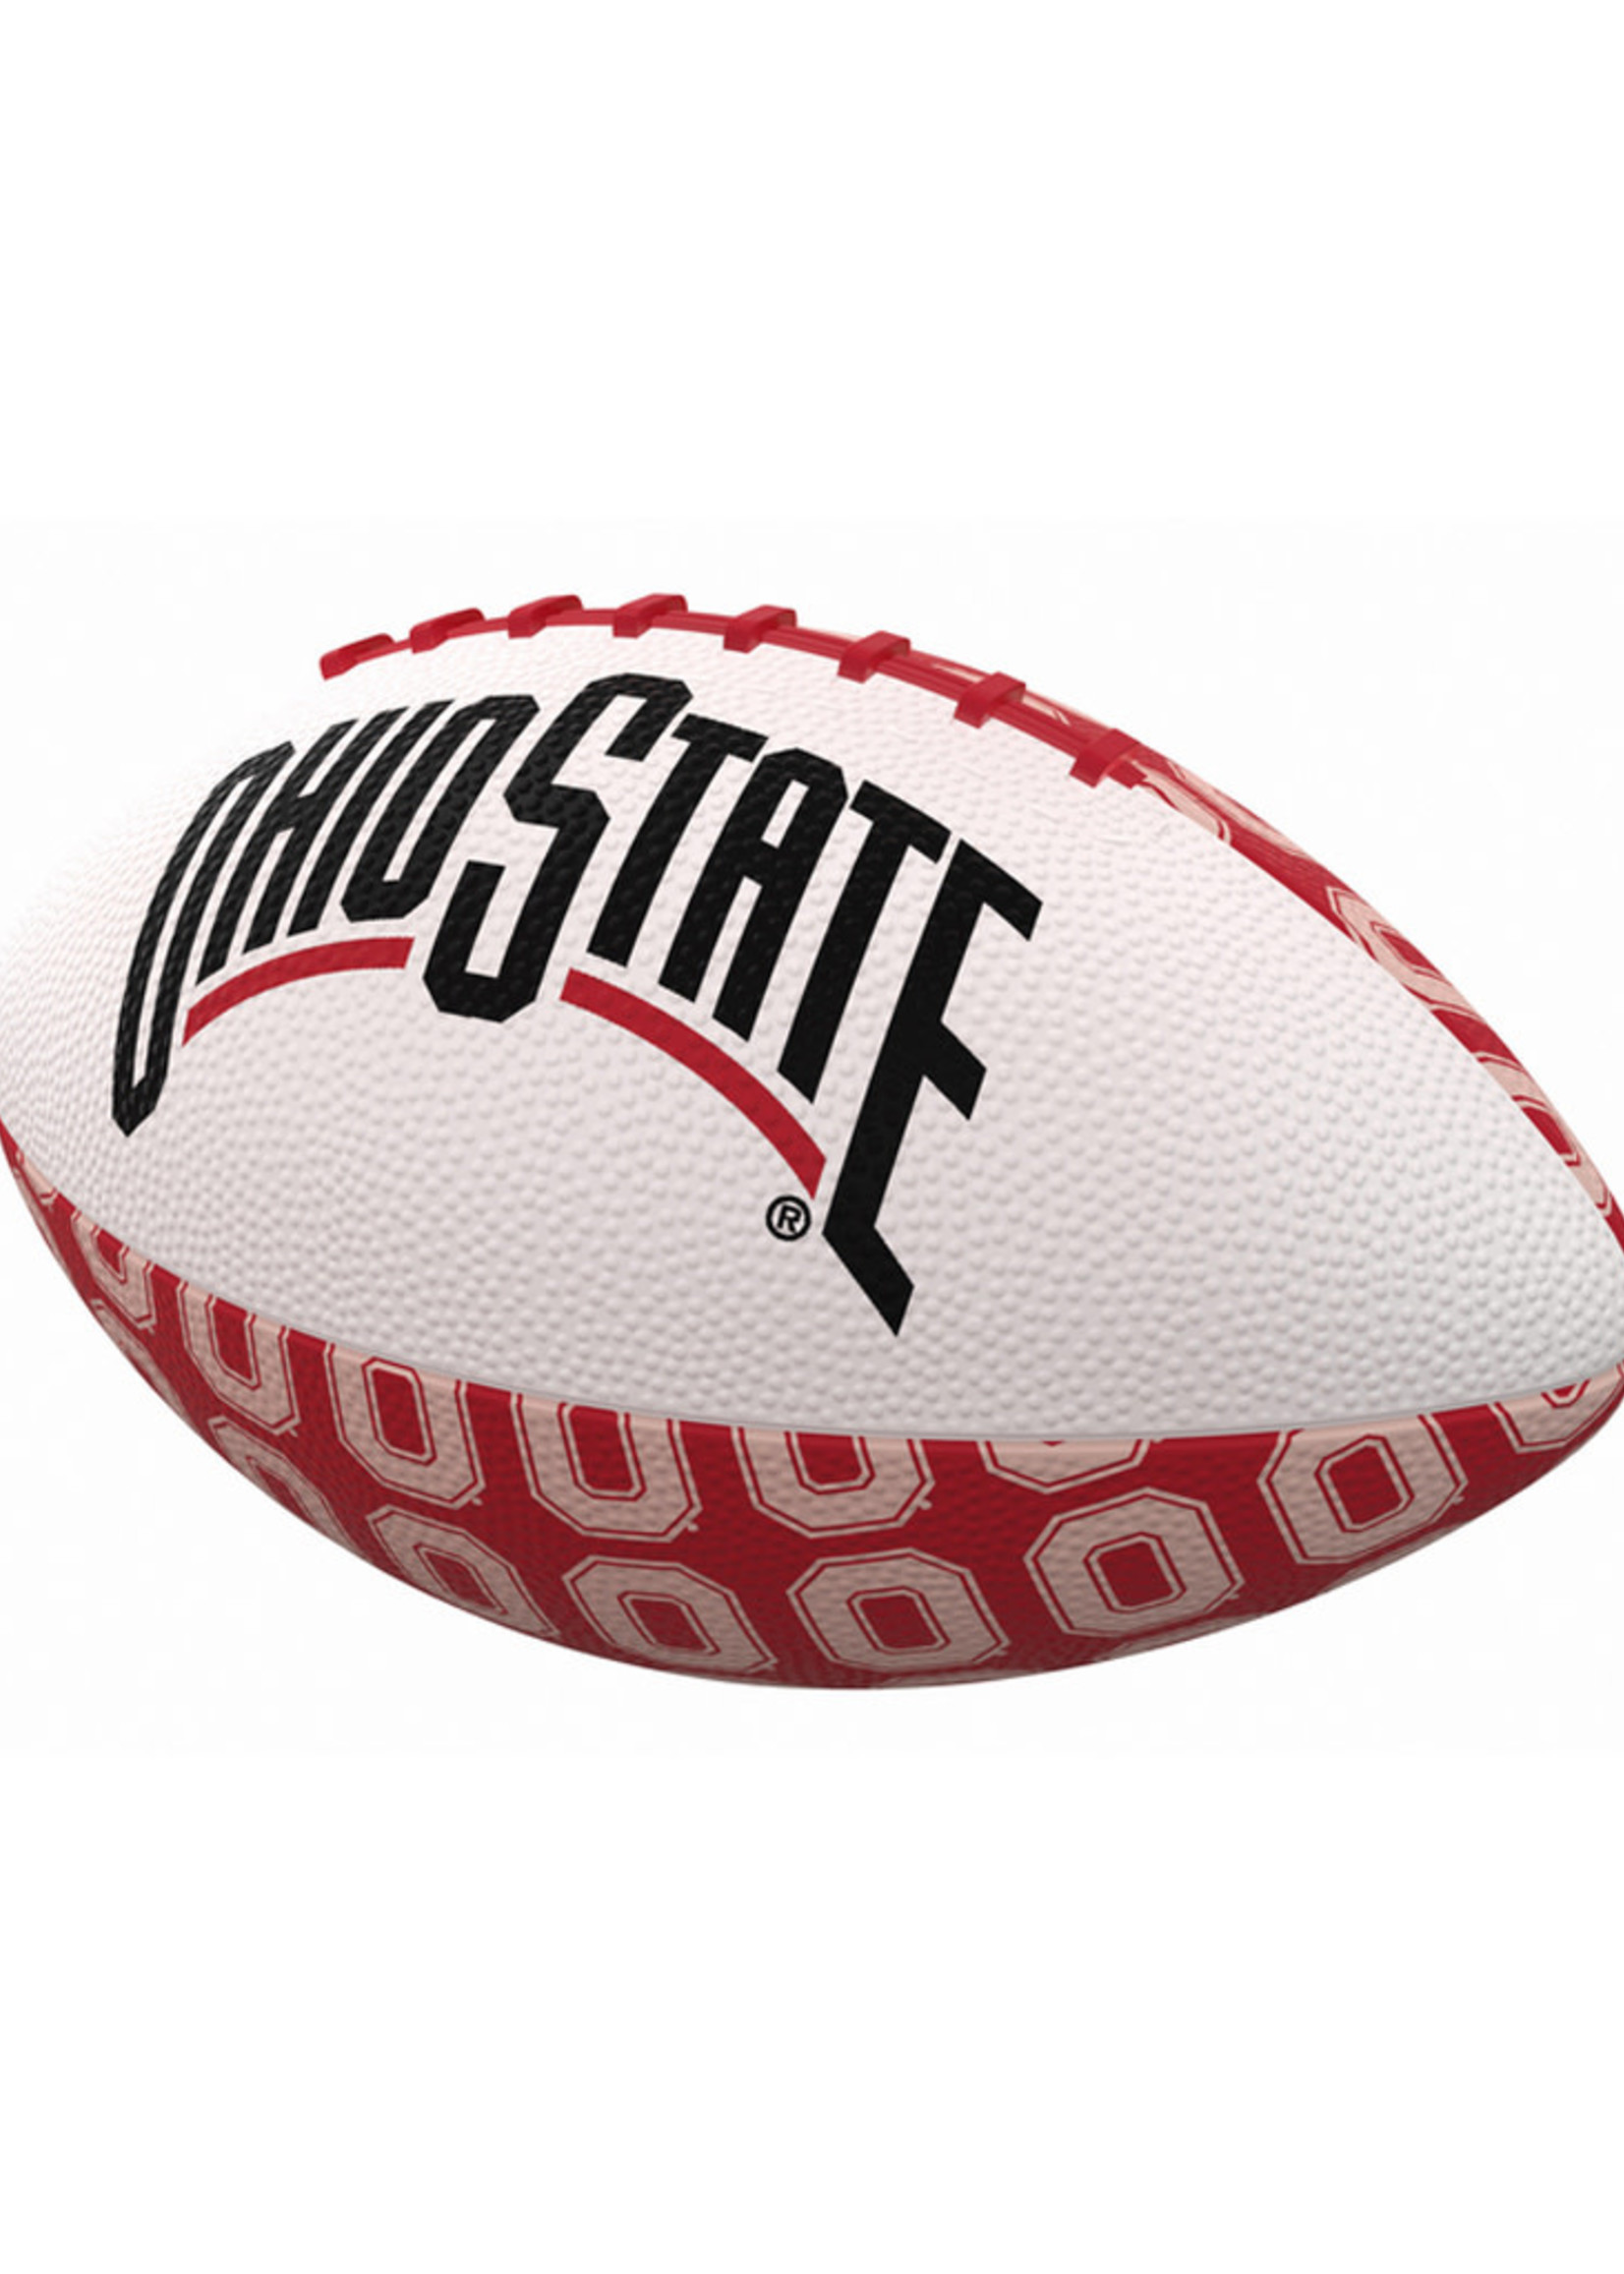 Ohio State Repeating Mini-Size Rubber Football